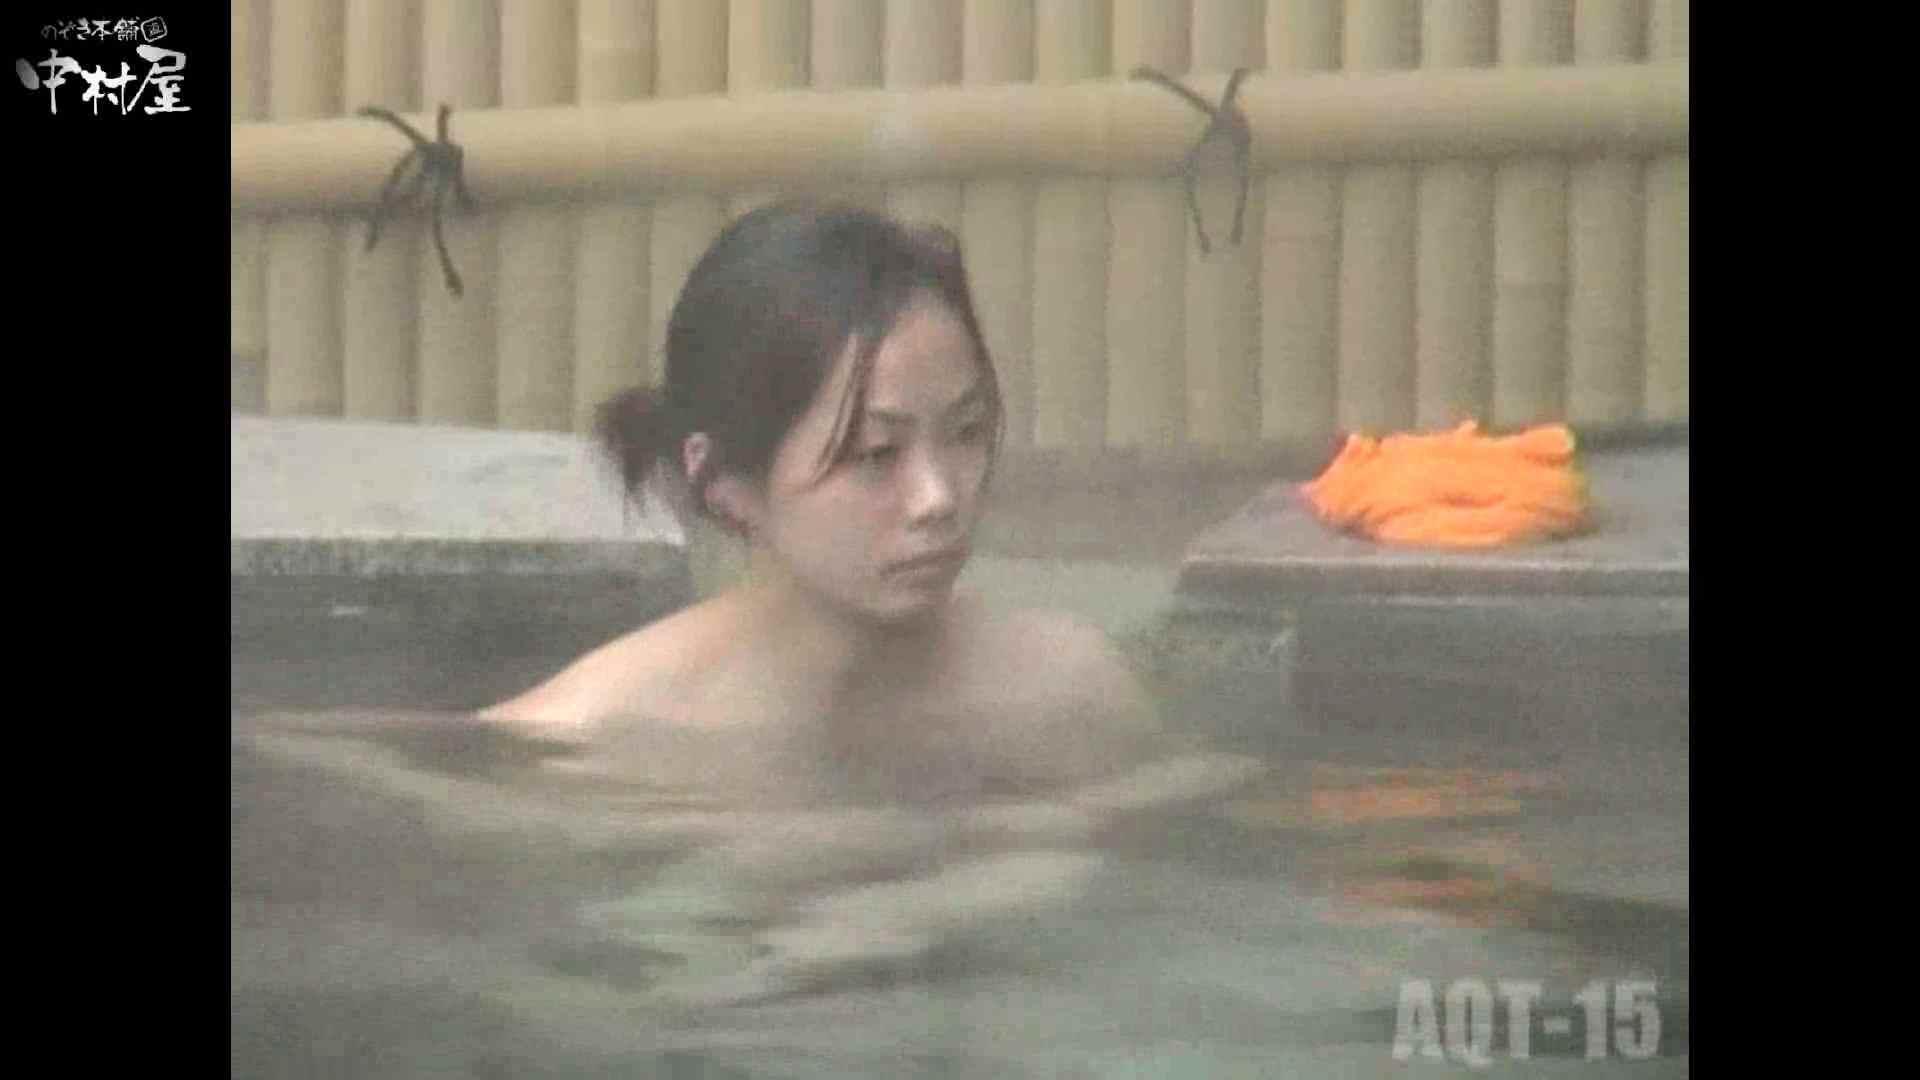 Aquaな露天風呂Vol.878潜入盗撮露天風呂十五判湯 其の八 潜入  96PIX 75